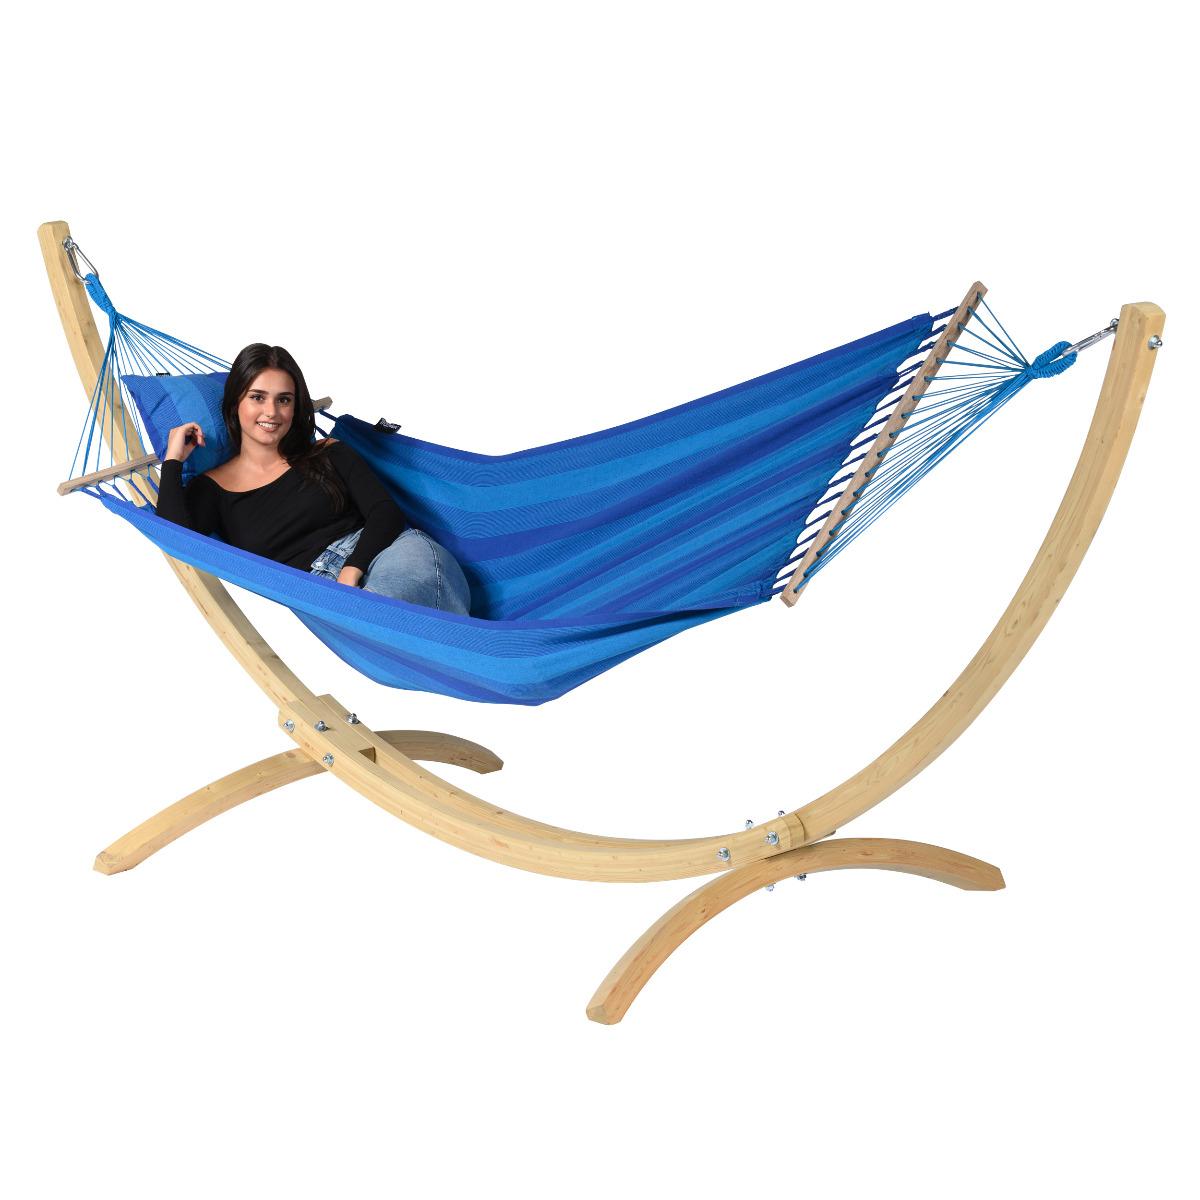 Hangmat met Standaard E�npersoons 'Wood & Relax' Blue - Blauw - Tropilex �